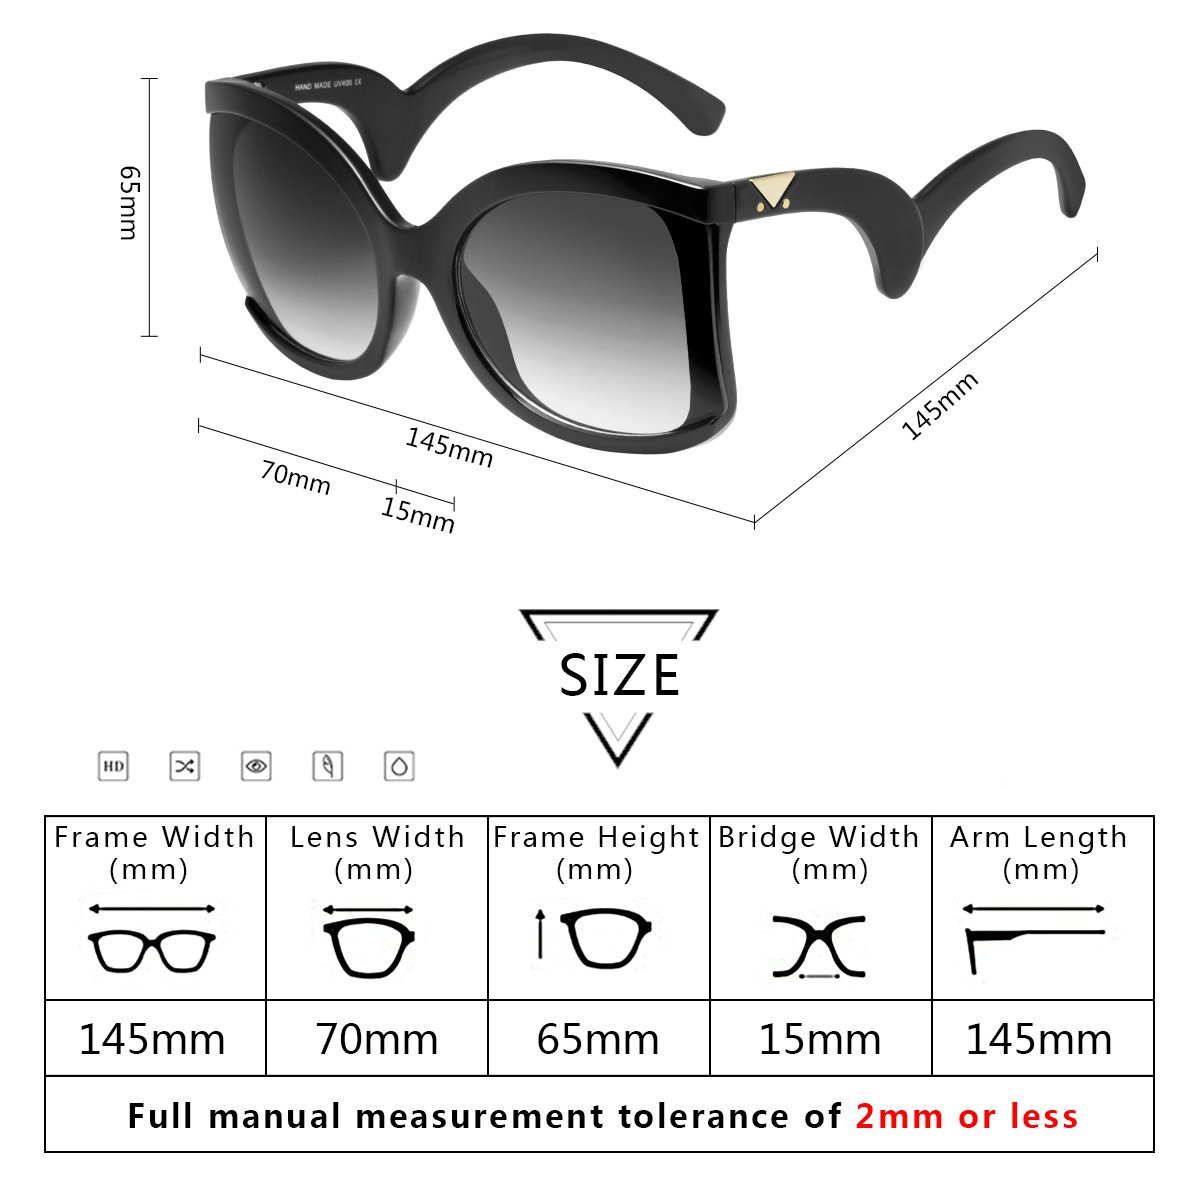 RAYSUN Sunglasses for Women Oversized Square Sunglasses Multi Tinted Frame Fashion Modern Shades 100% UV Protection Eyewear